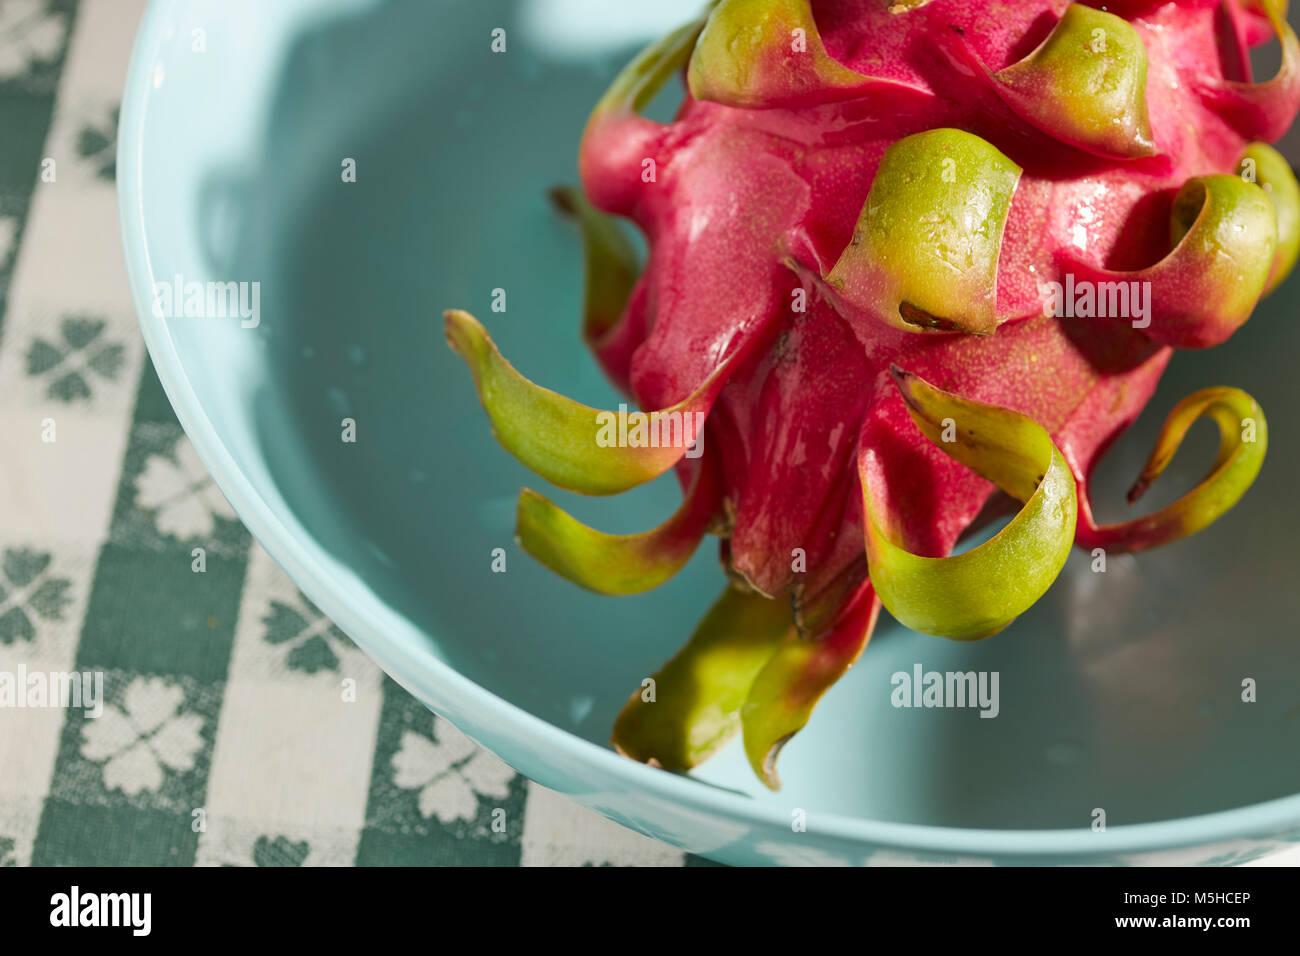 a whole, fresh, ripe Dragon Fruit - Stock Image